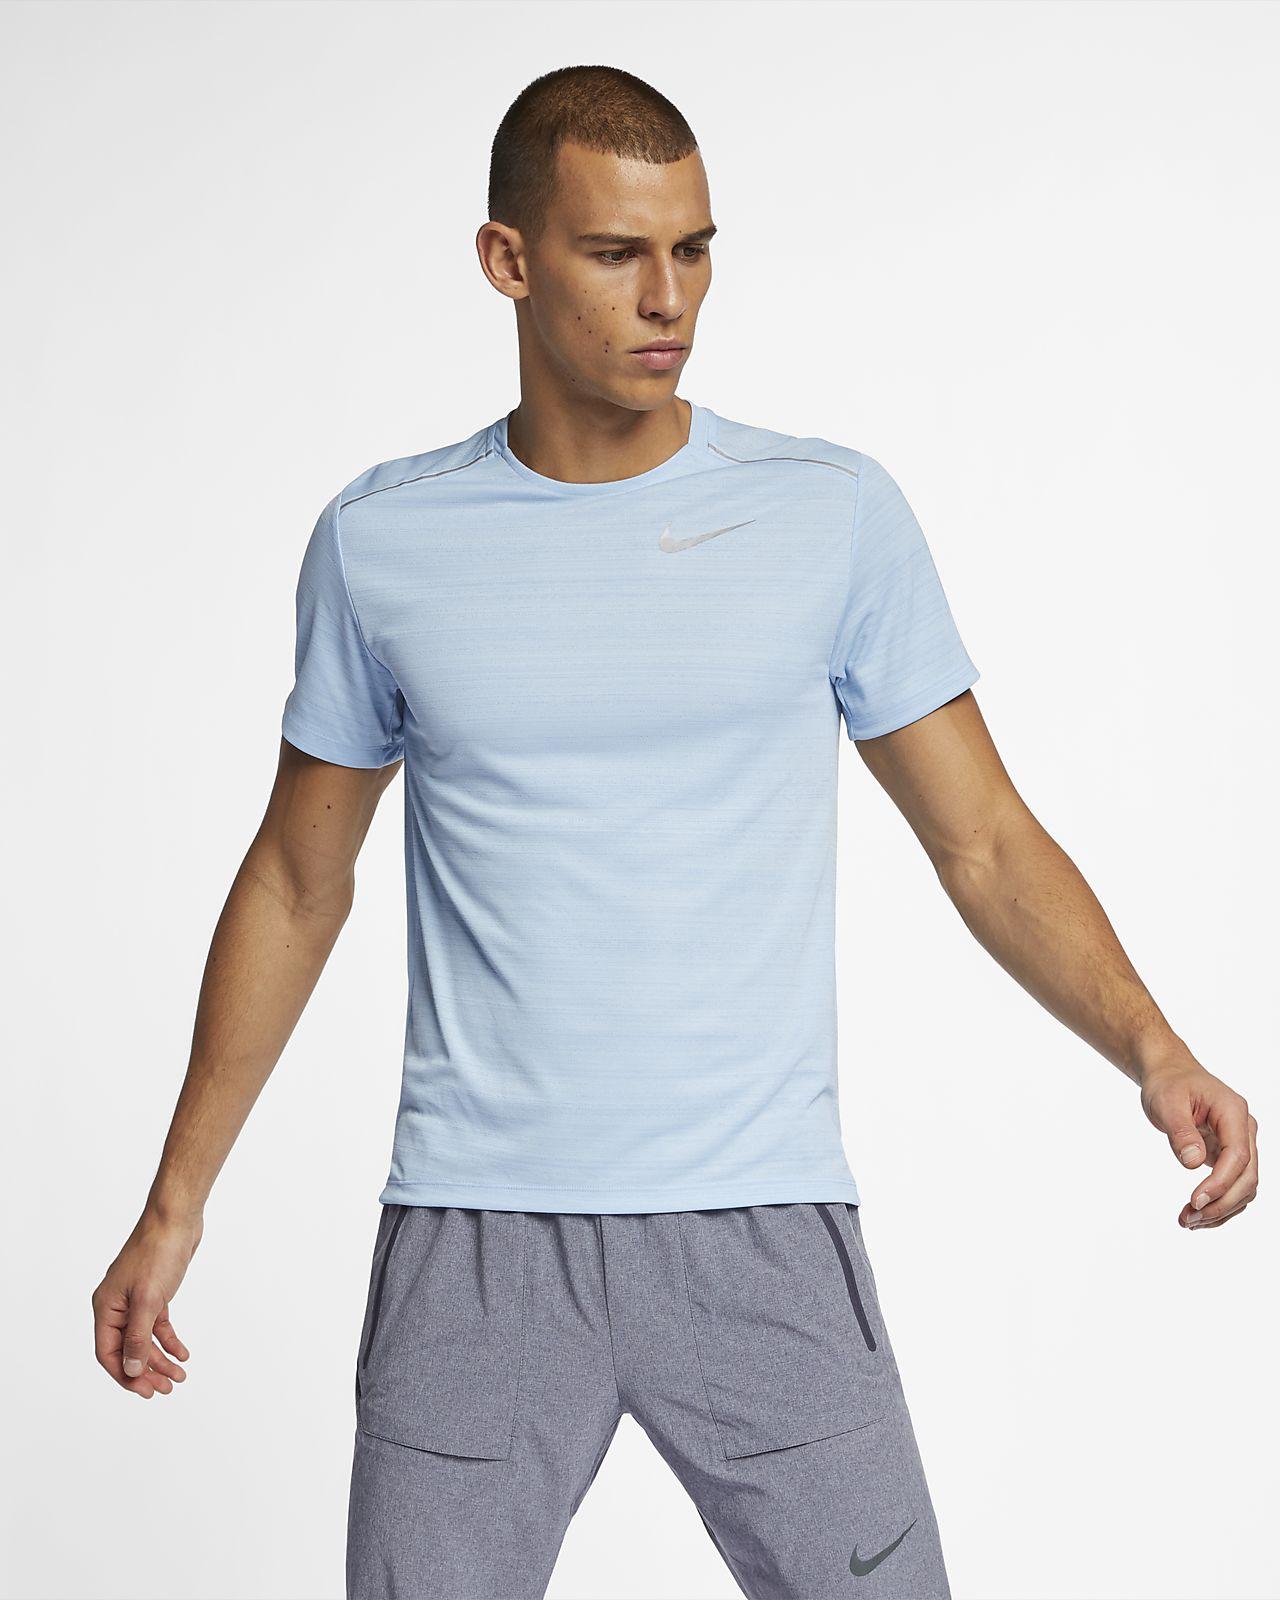 6483e1c8aeff Pánské běžecké tričko Nike Dri-FIT Miler s krátkým rukávem. Nike.com CZ